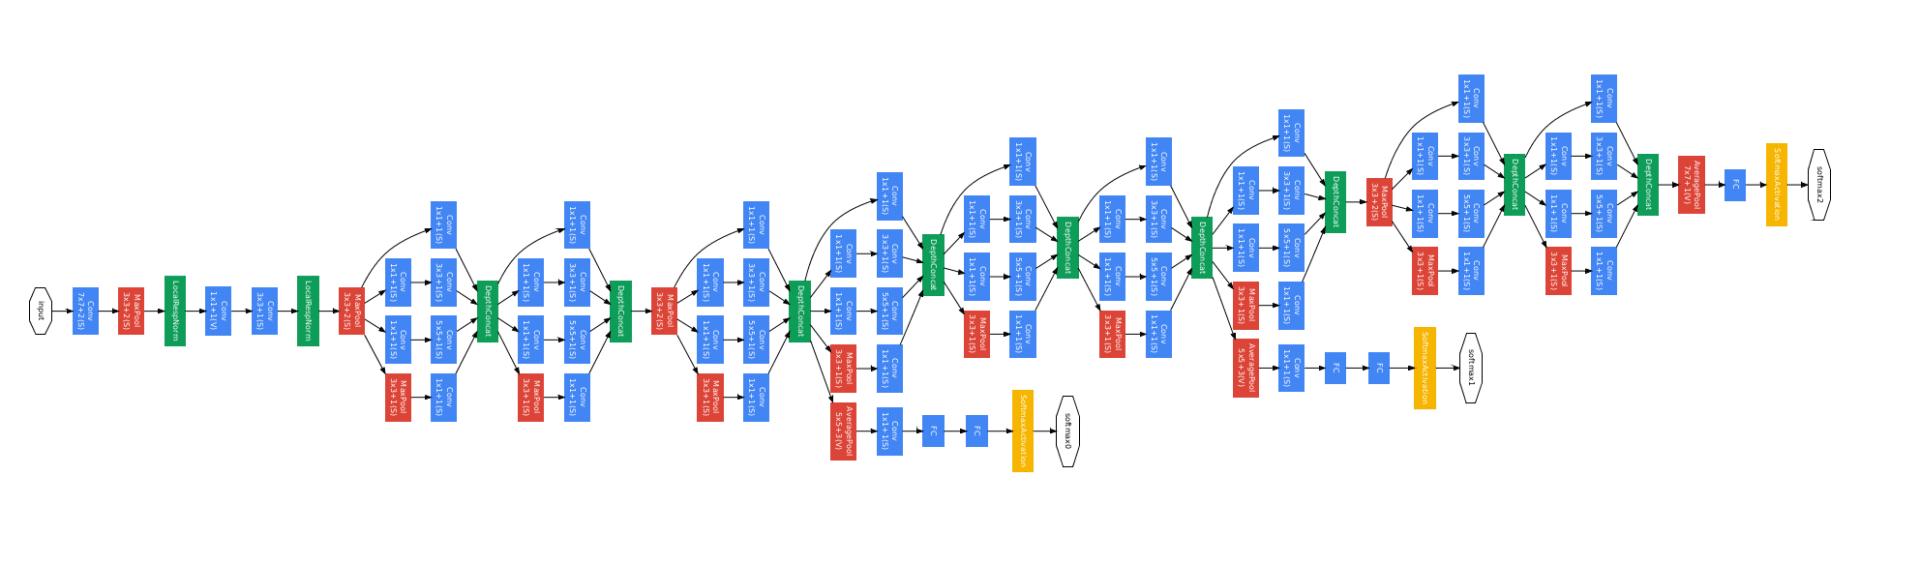 Abbildung des GoogleNet zur Bildklassifikation